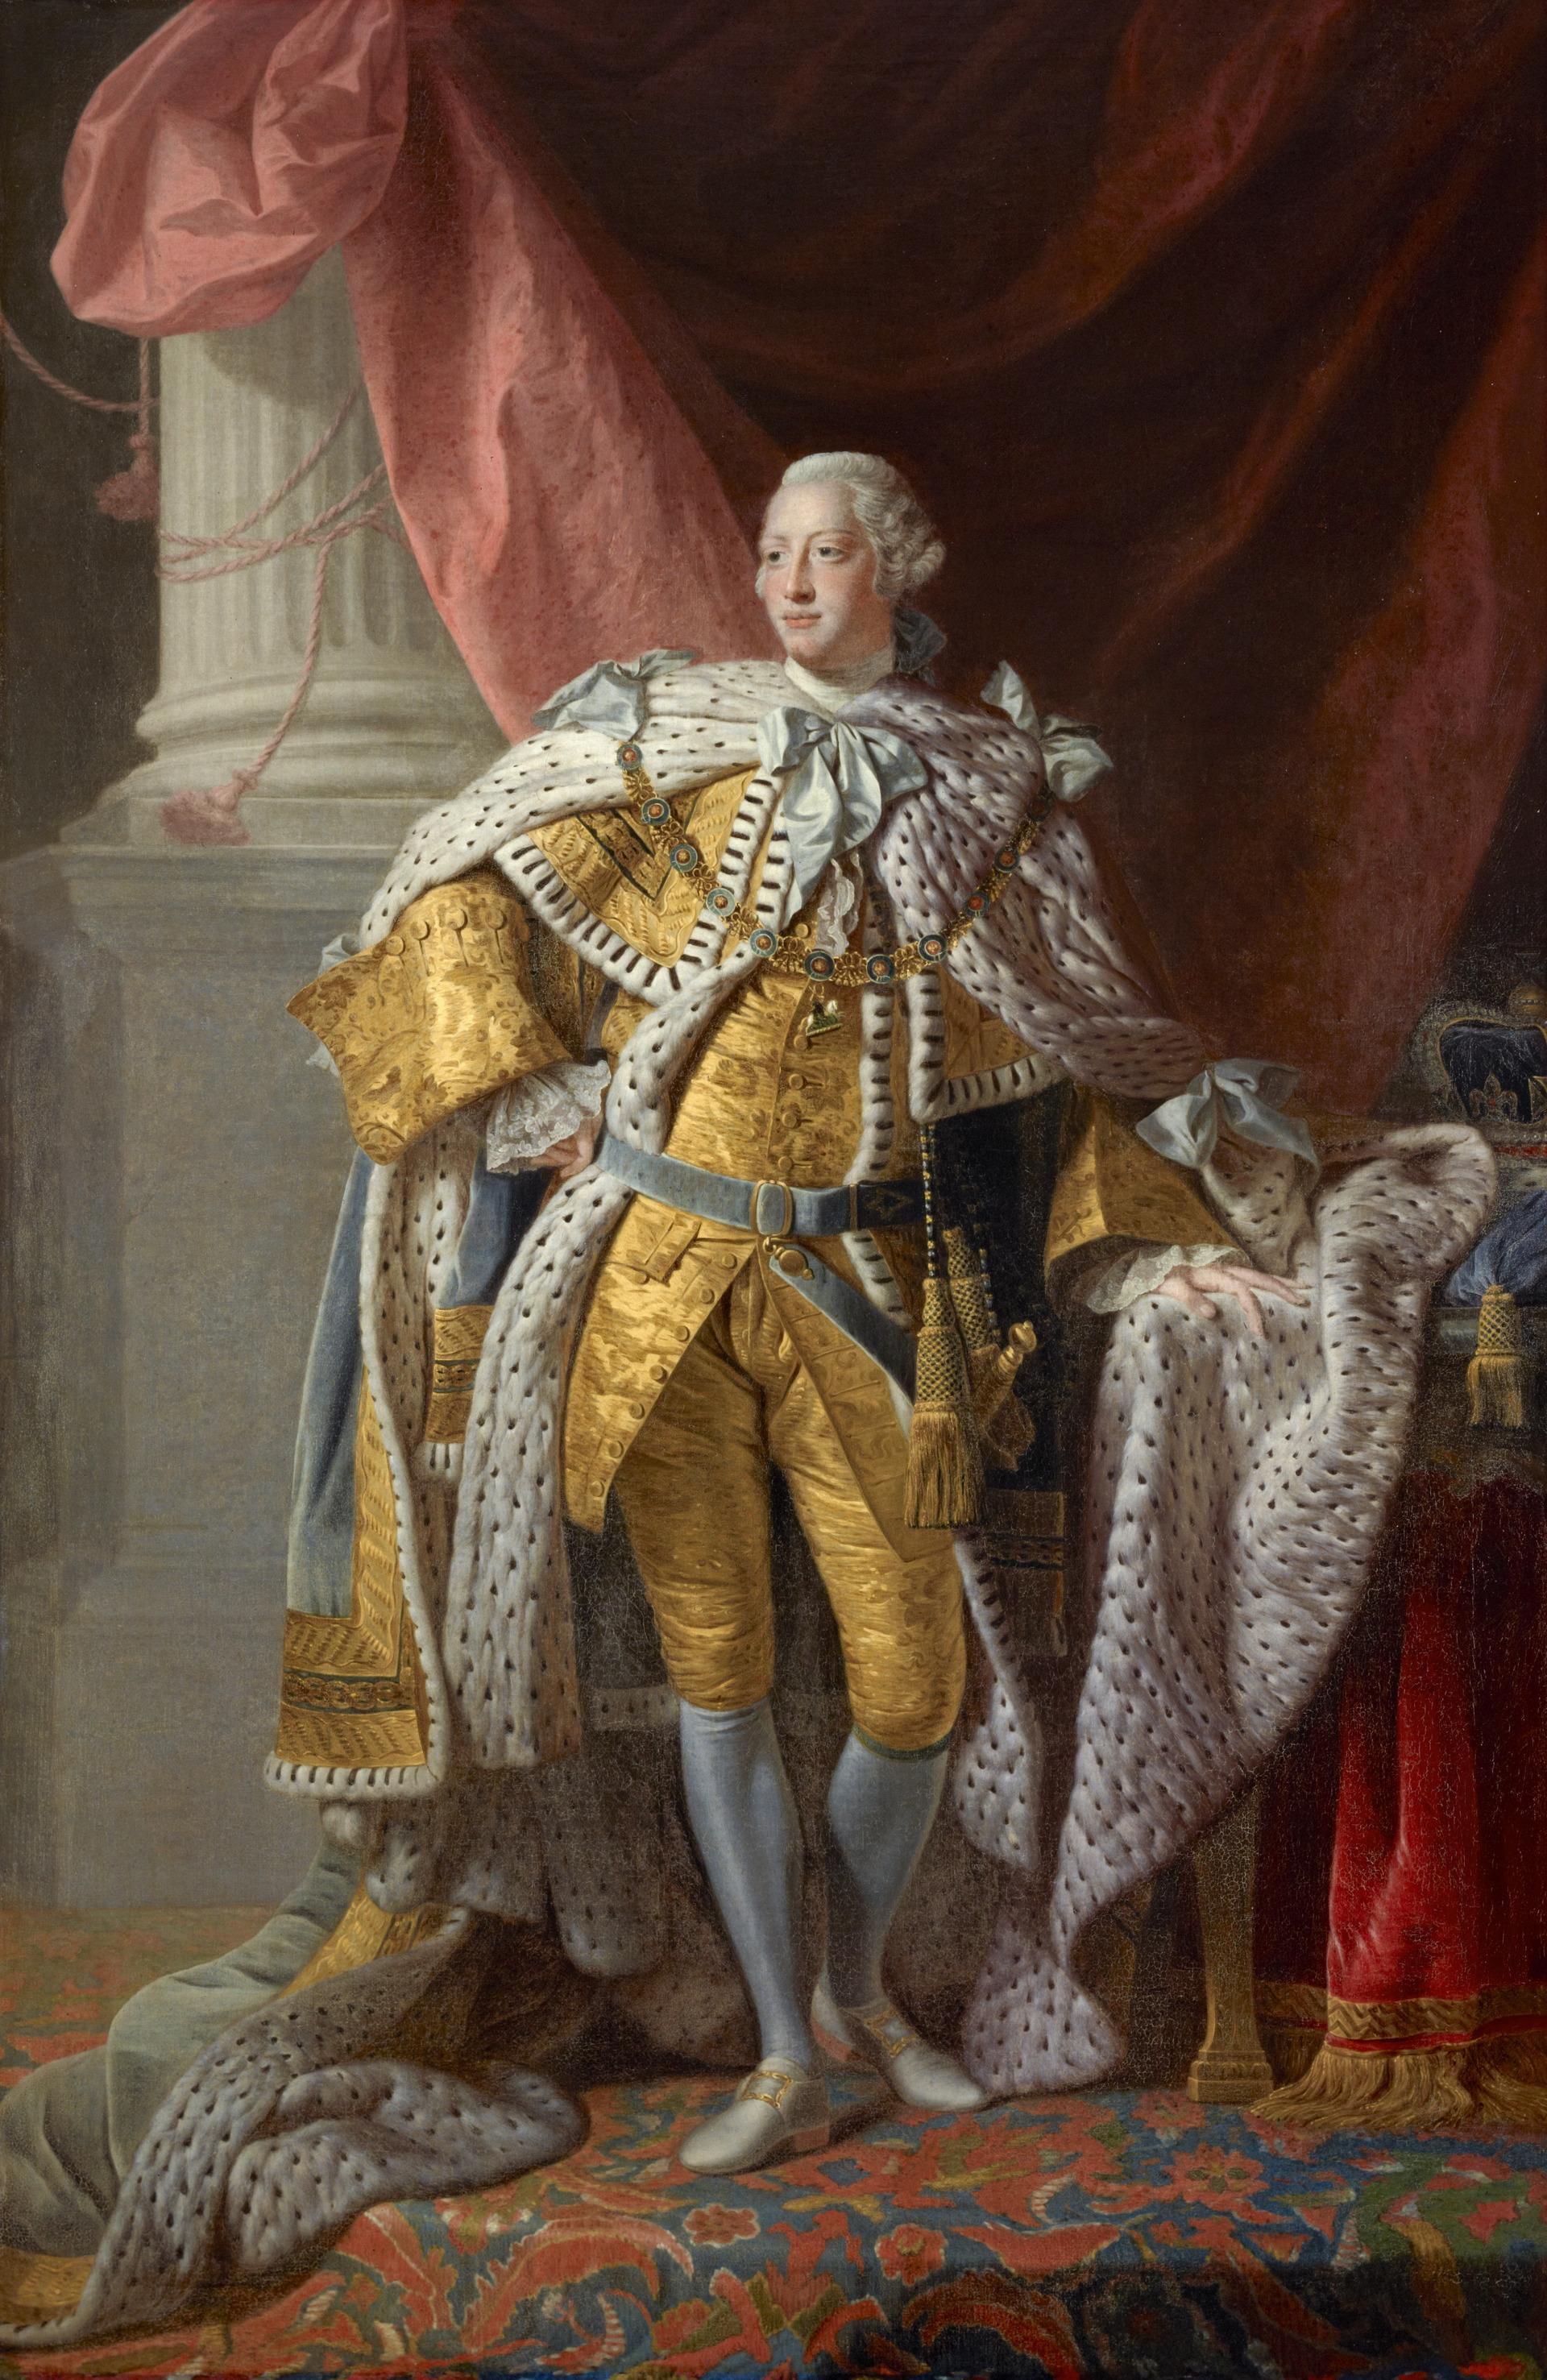 George III, 1738 - 1820. Reigned 1760 - 1820 ©Studio of Allan Ramsay